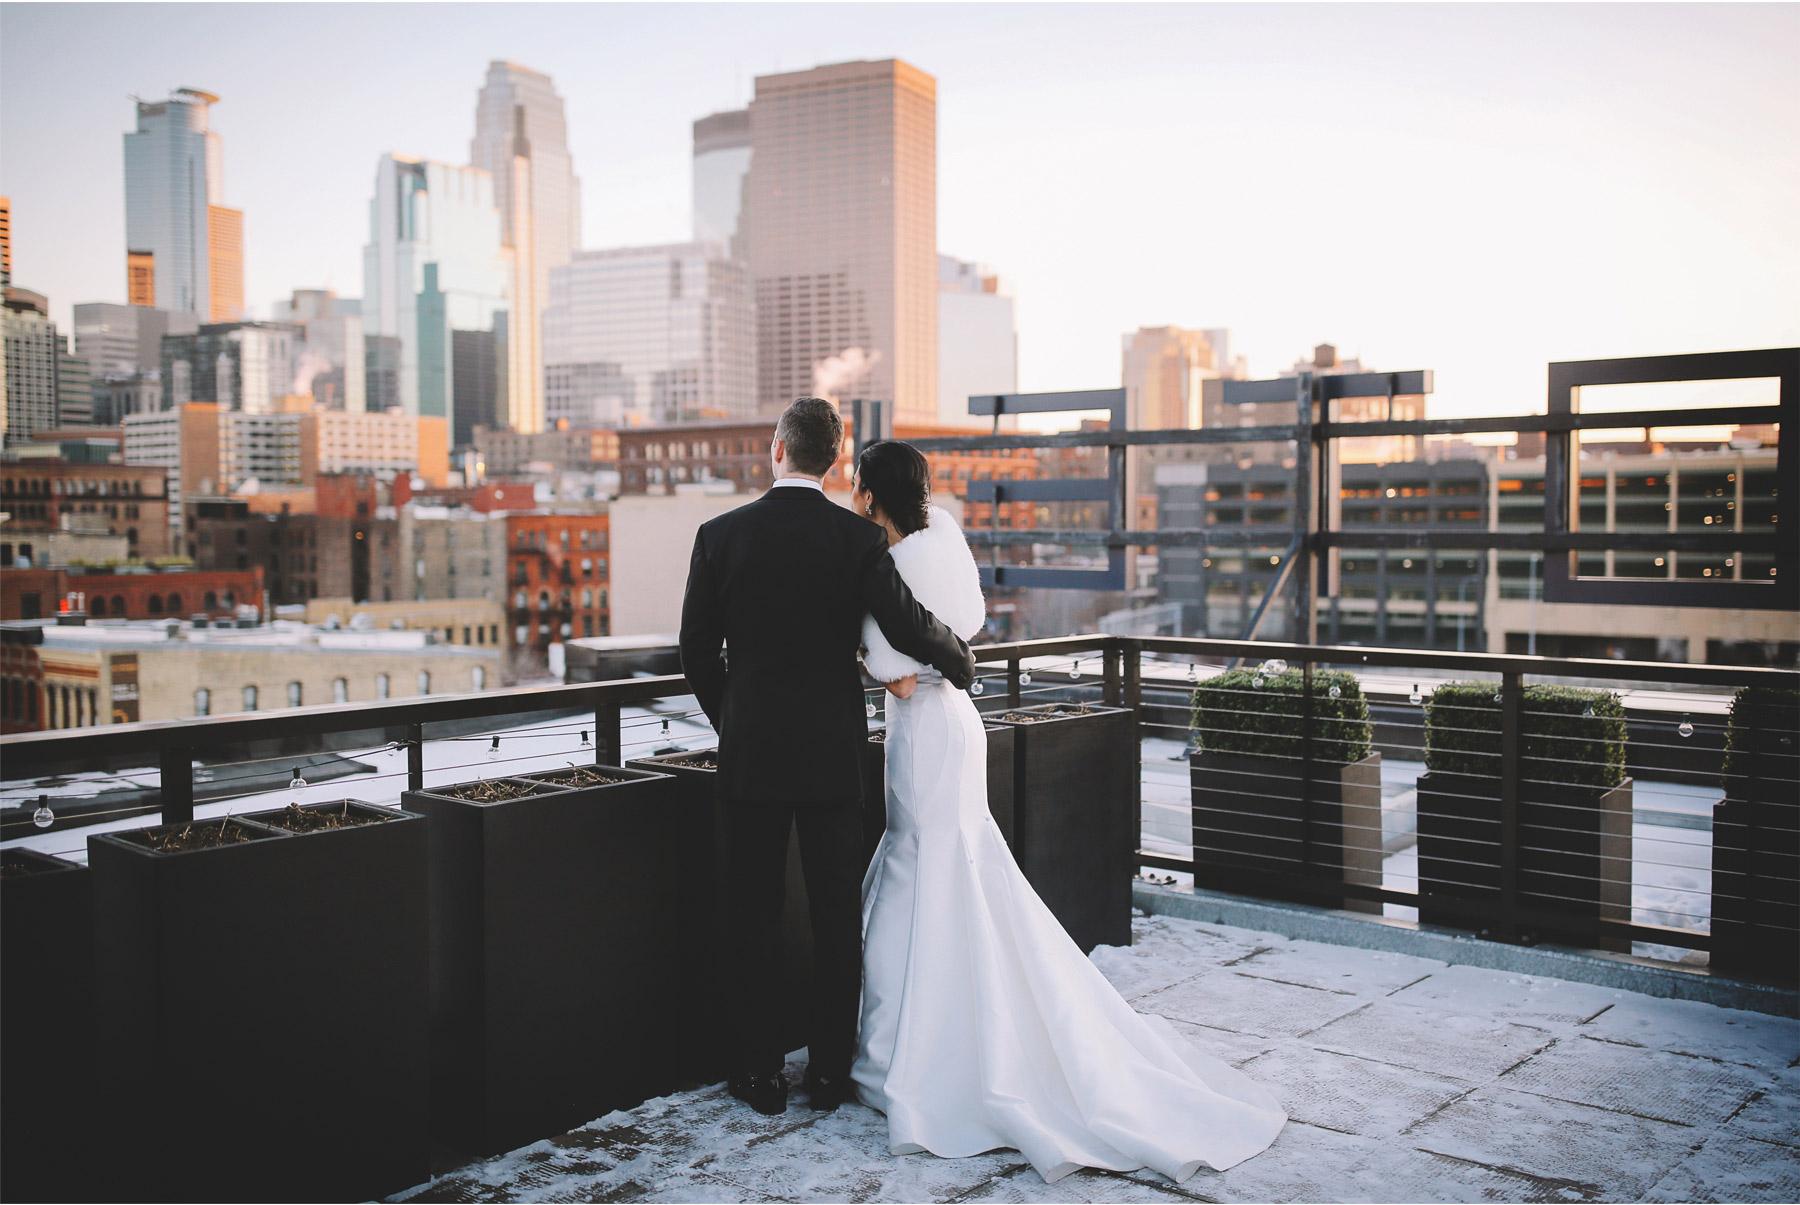 12-Minneapolis-Minnesota-Wedding-Photographer-Andrew-Vick-Photography-Winter-Bride-and-Groom-Downtown-Skyline-Allison-and-Steve.jpg